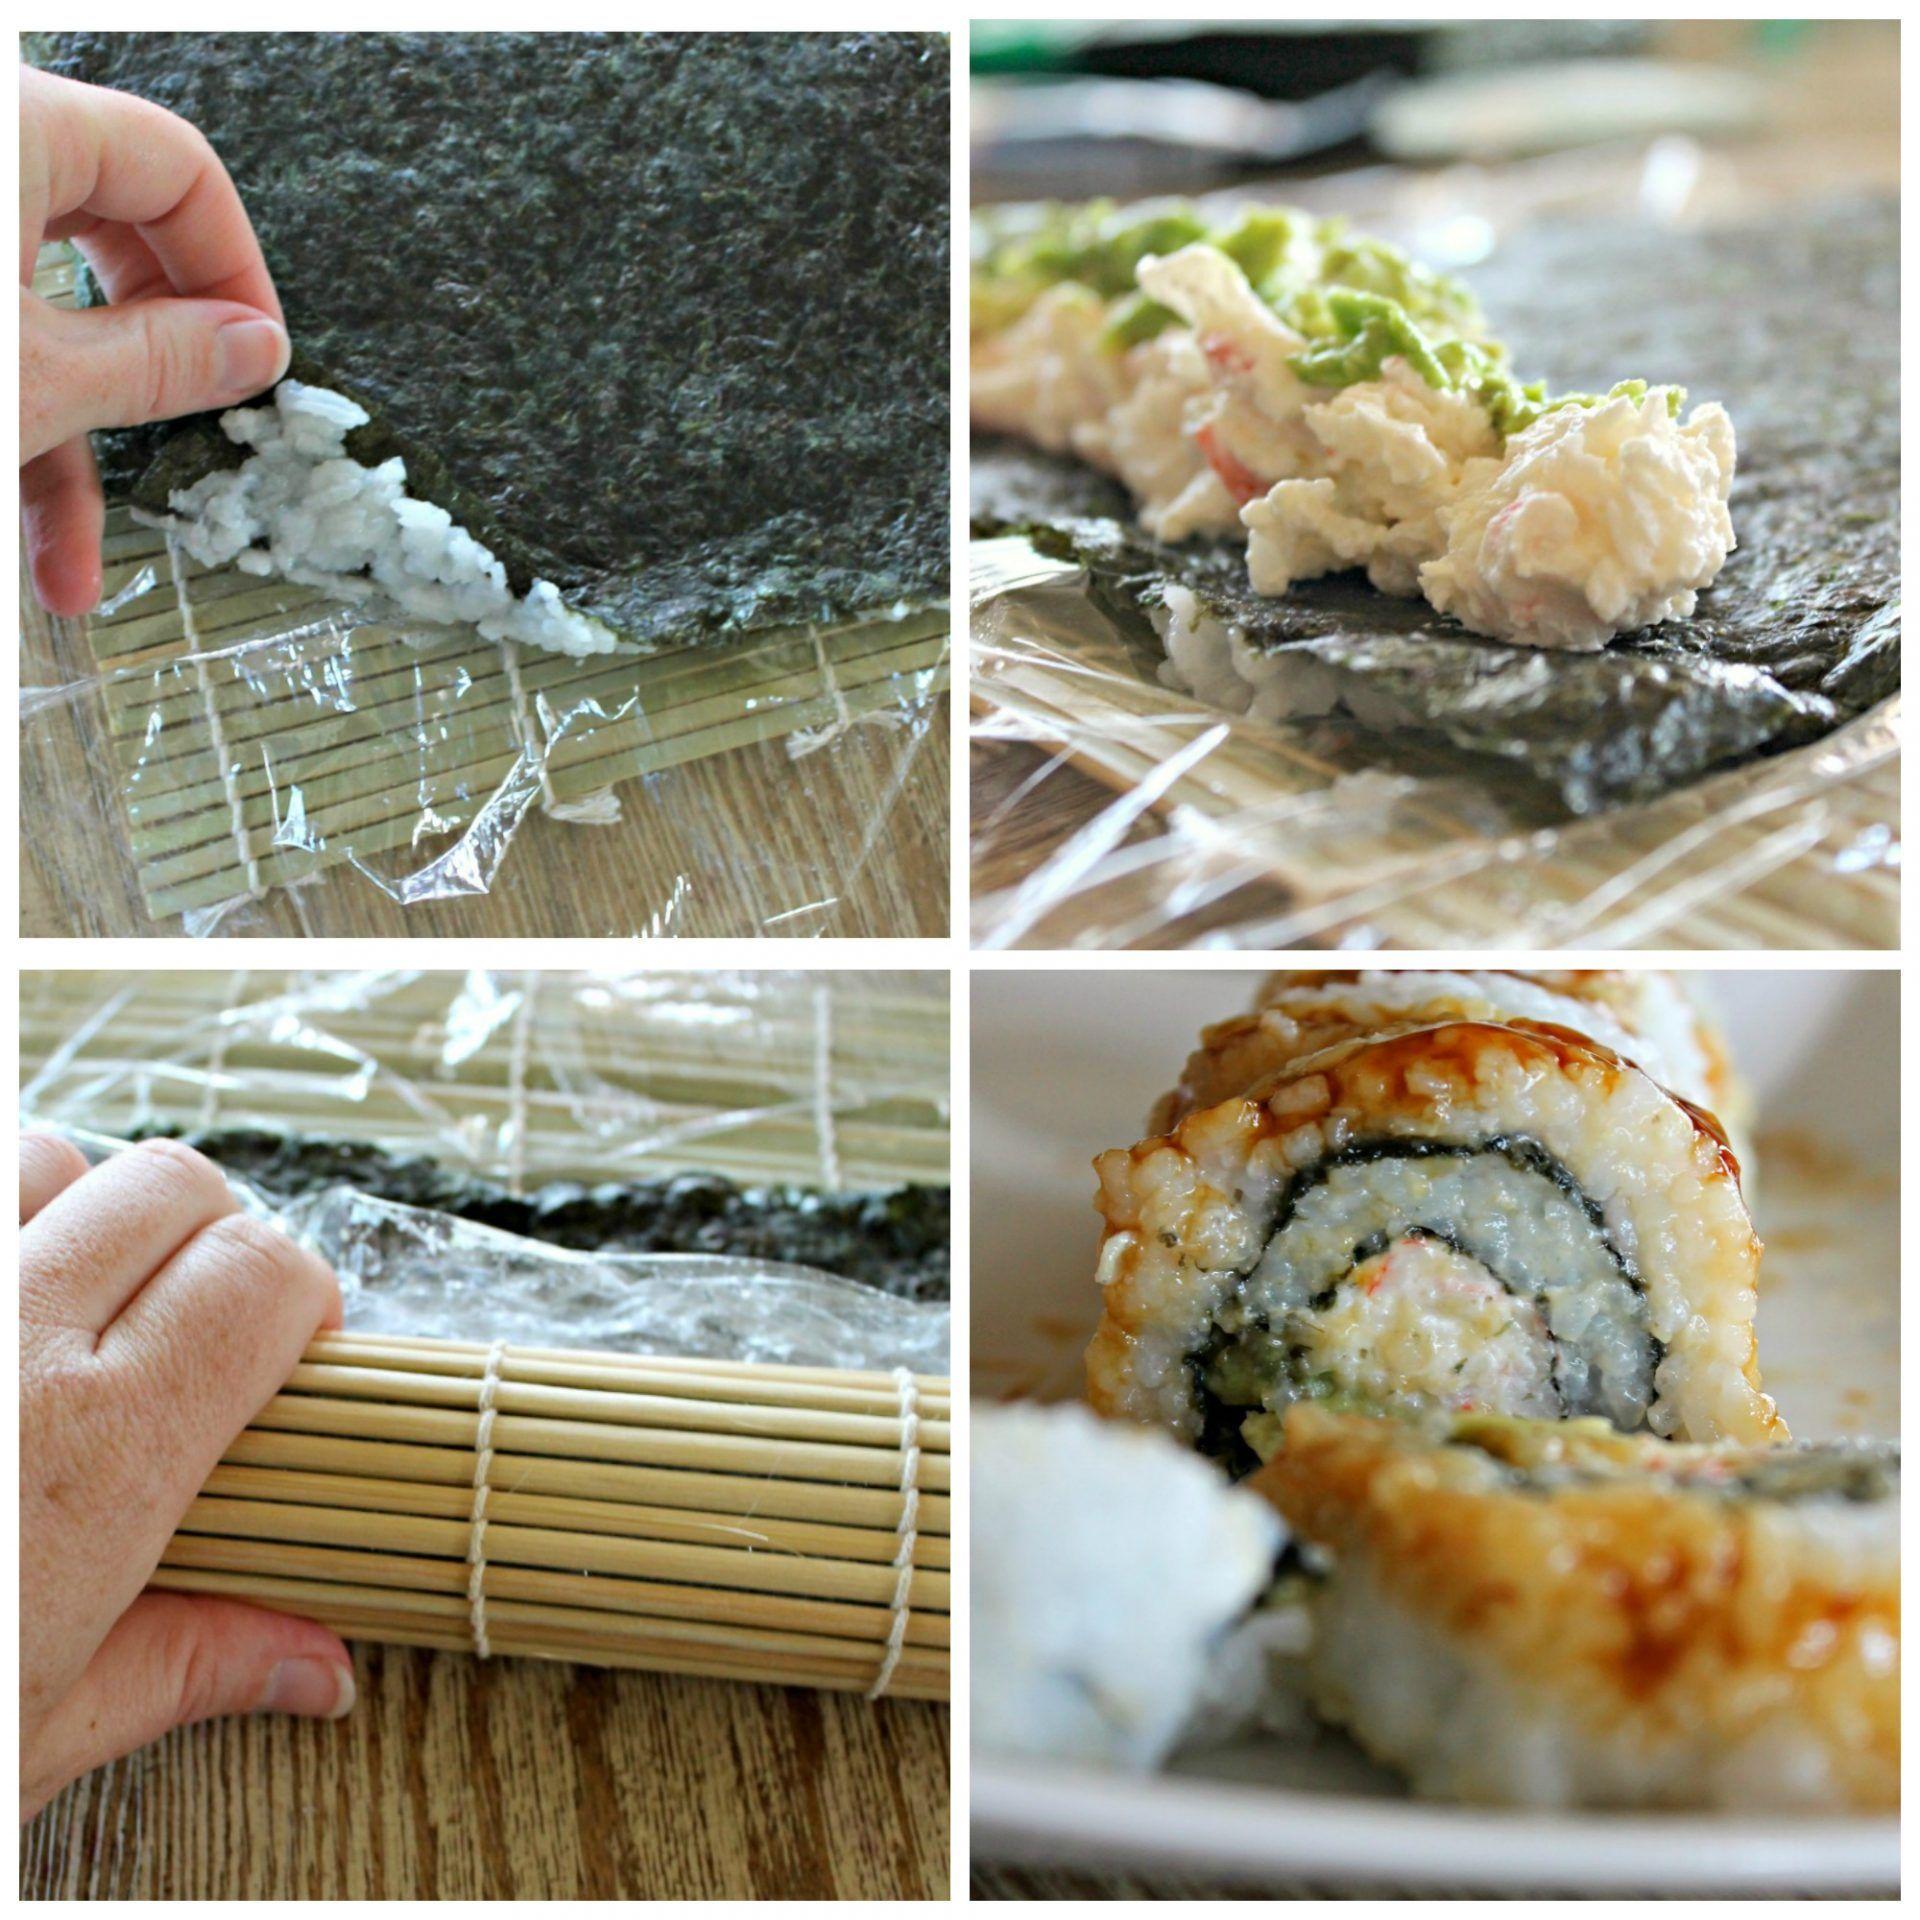 How To Make Homemade Sushi Crab Sushi Recipe Homemade Sushi Sushi Recipes Homemade Crab Sushi